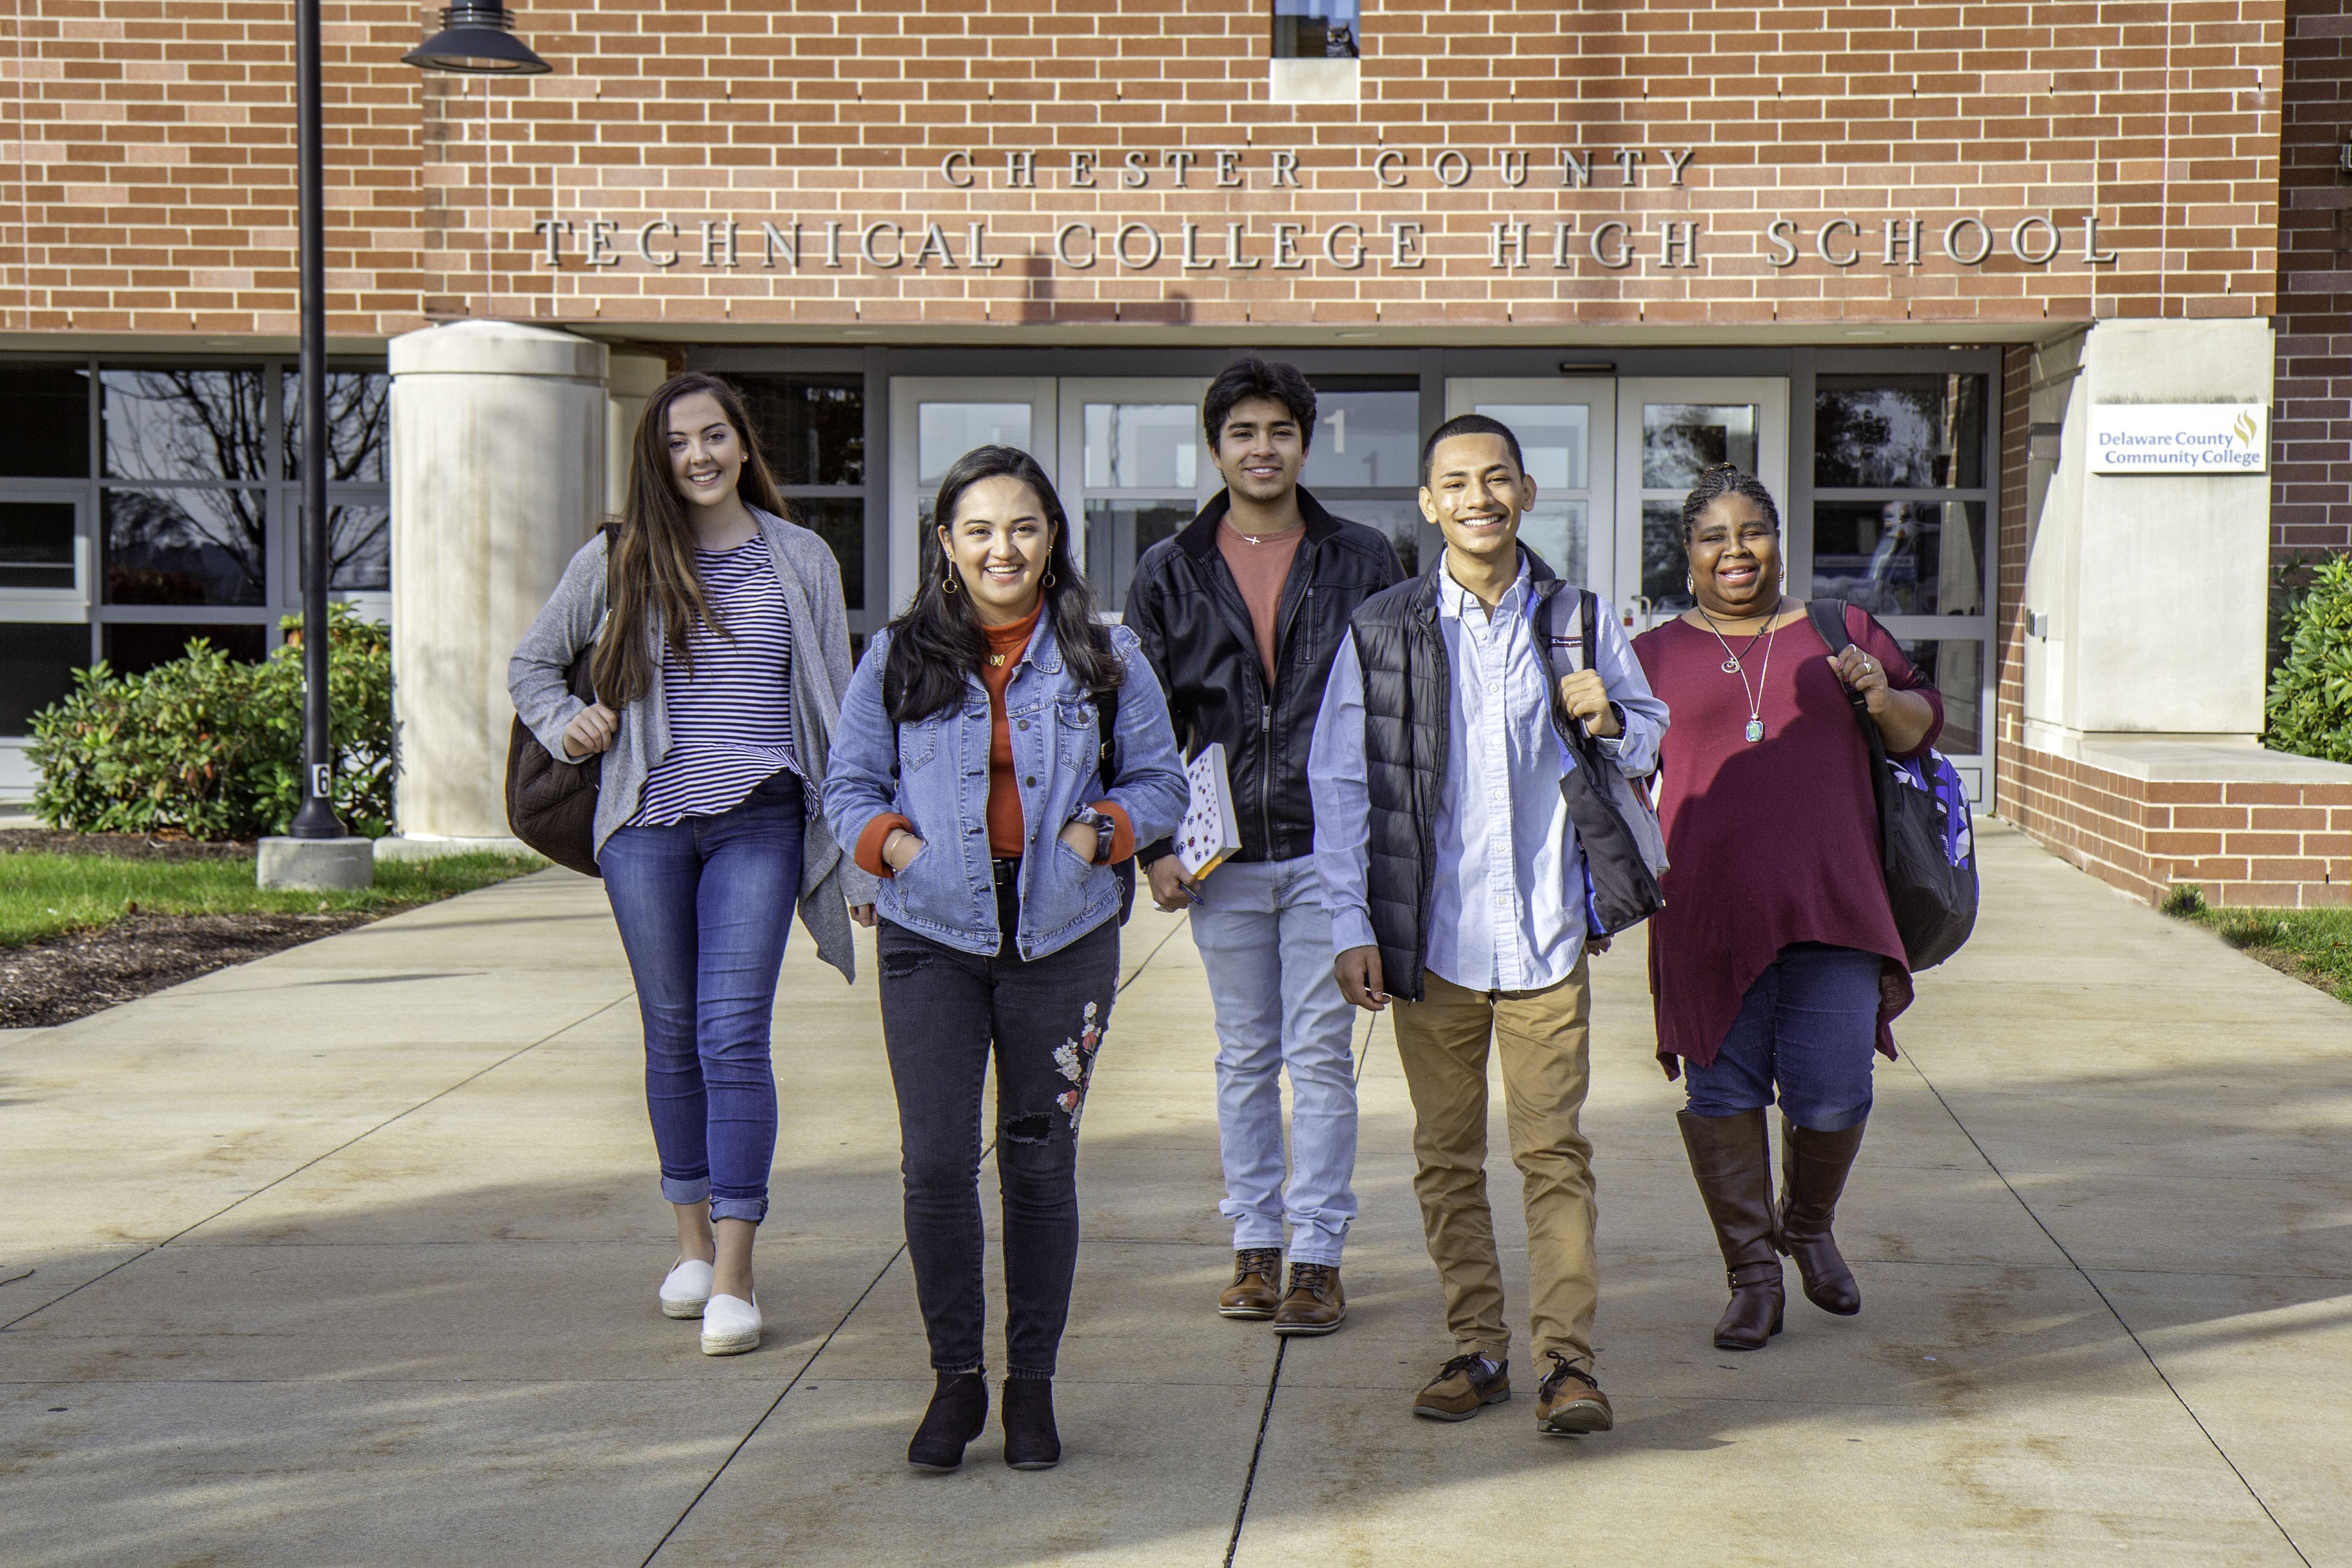 Delaware County Community College | LinkedIn